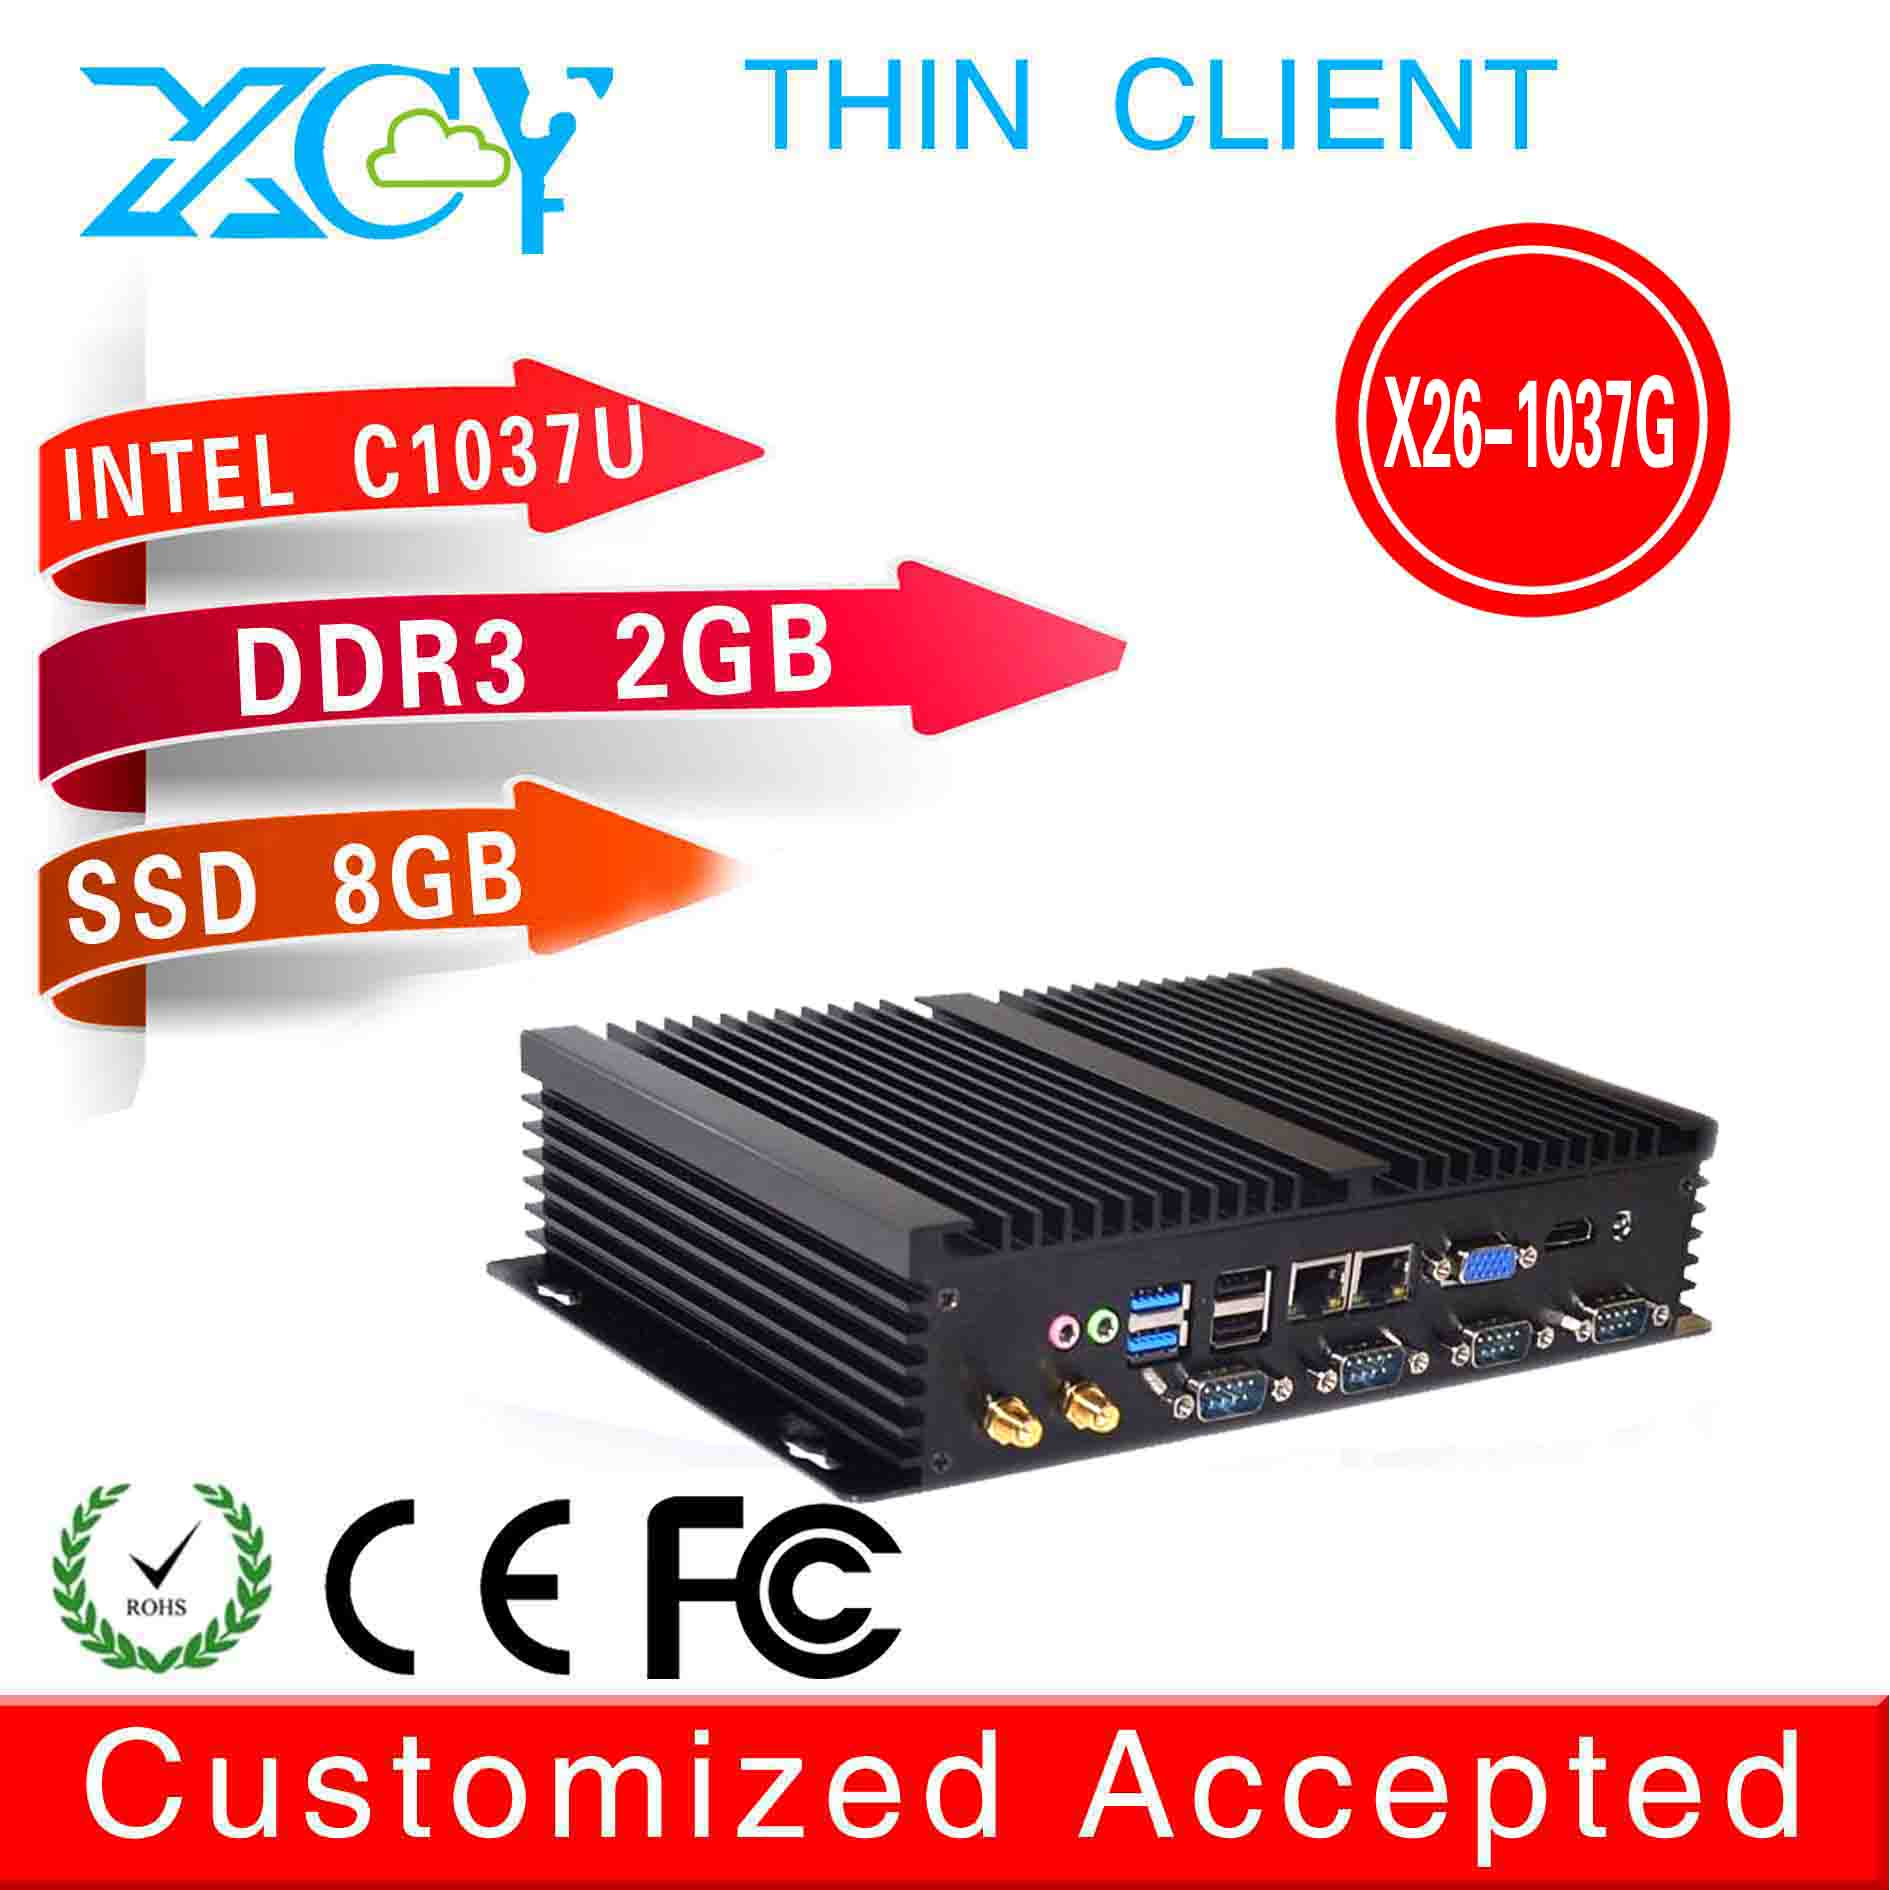 high performance high cpu no noise mini computer x26-1037G mini industrial pc intel c1037u network 2g ram 8g ssd fanless desktop(China (Mainland))